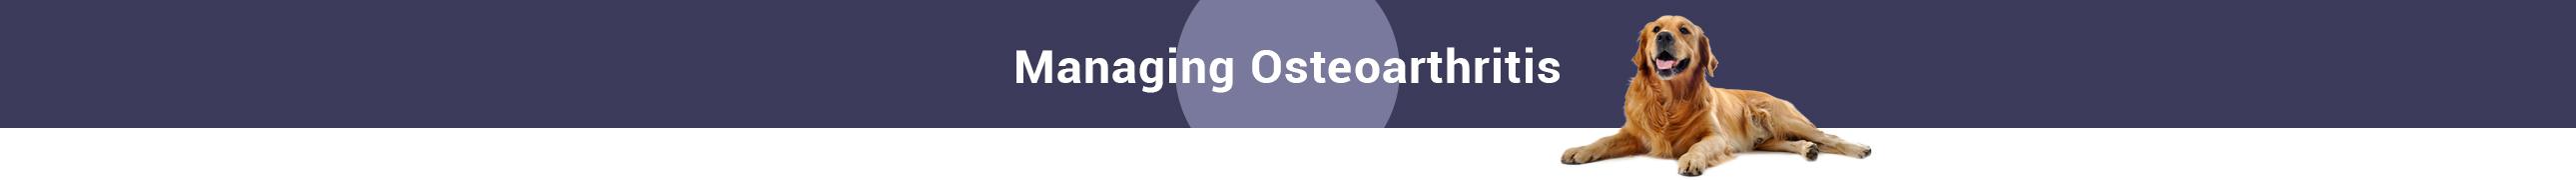 ManagingOsteoarthritis-Slider